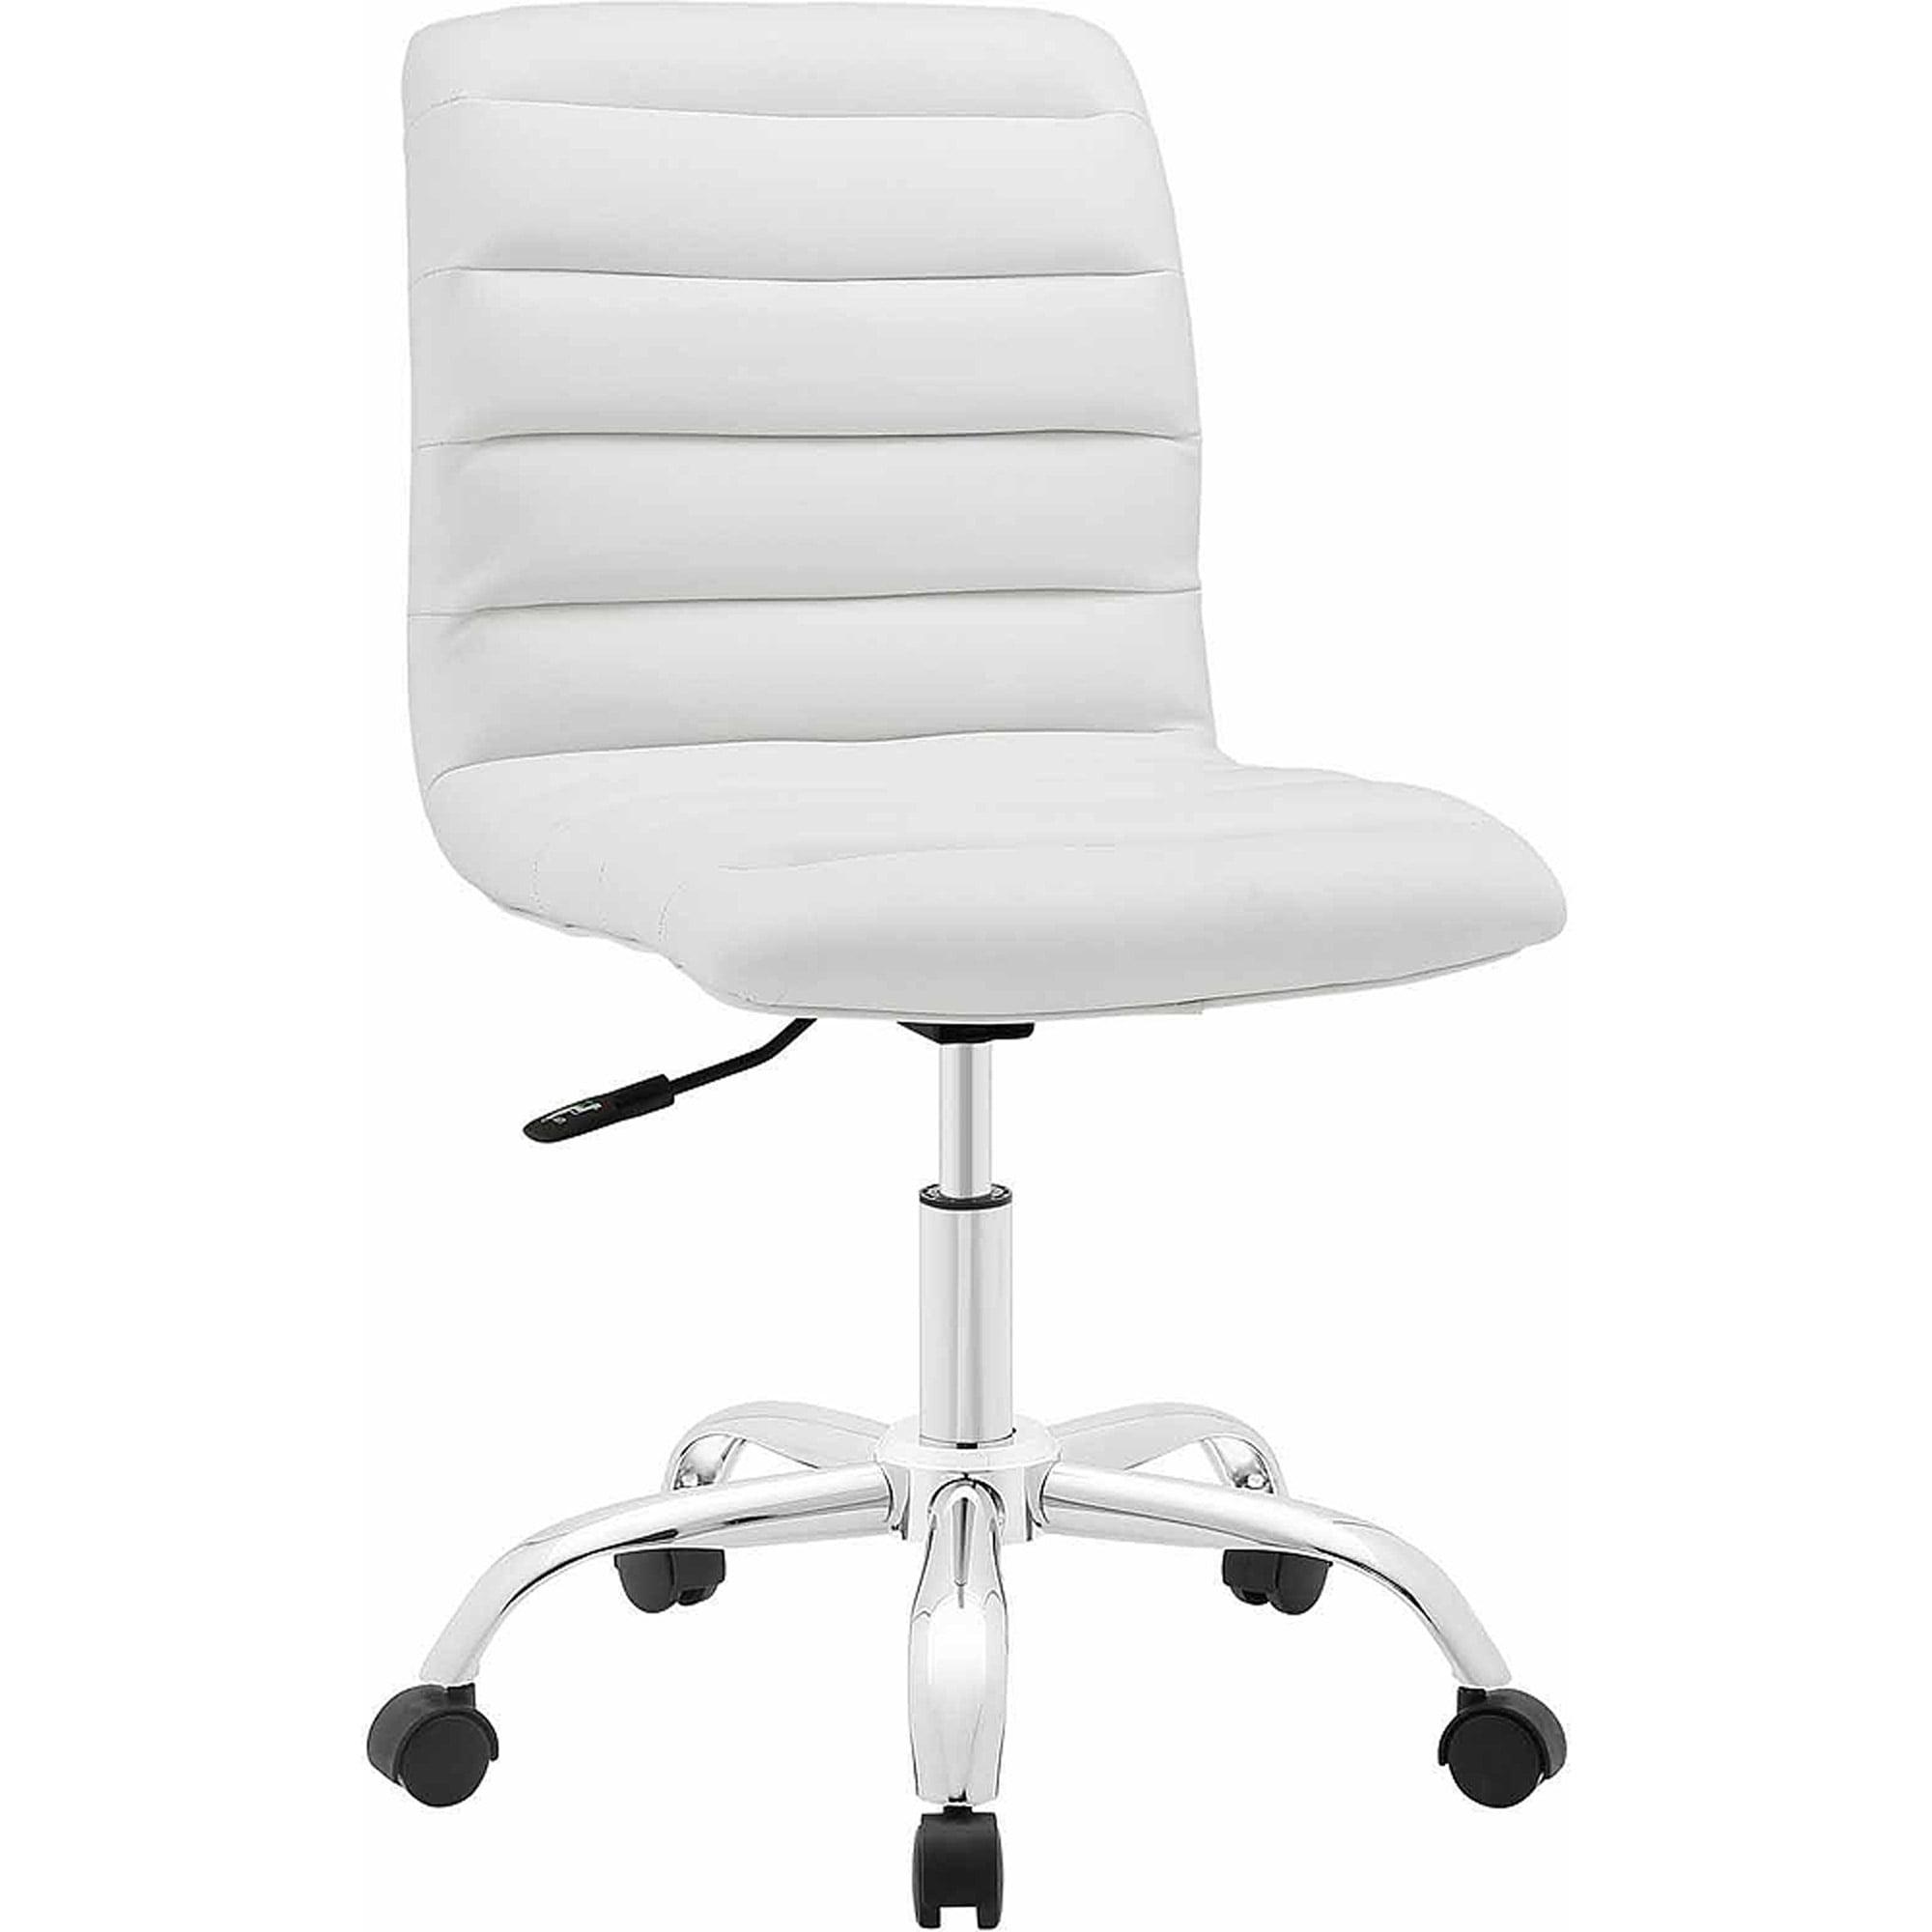 baxton studio iona mid century retro modern. Baxton Studio Iona Mid-Century Retro Modern Gray Fabric Upholstered Button-Tufted Wingback Rocking Chair (Box 1 Of 2) - Walmart.com Mid Century